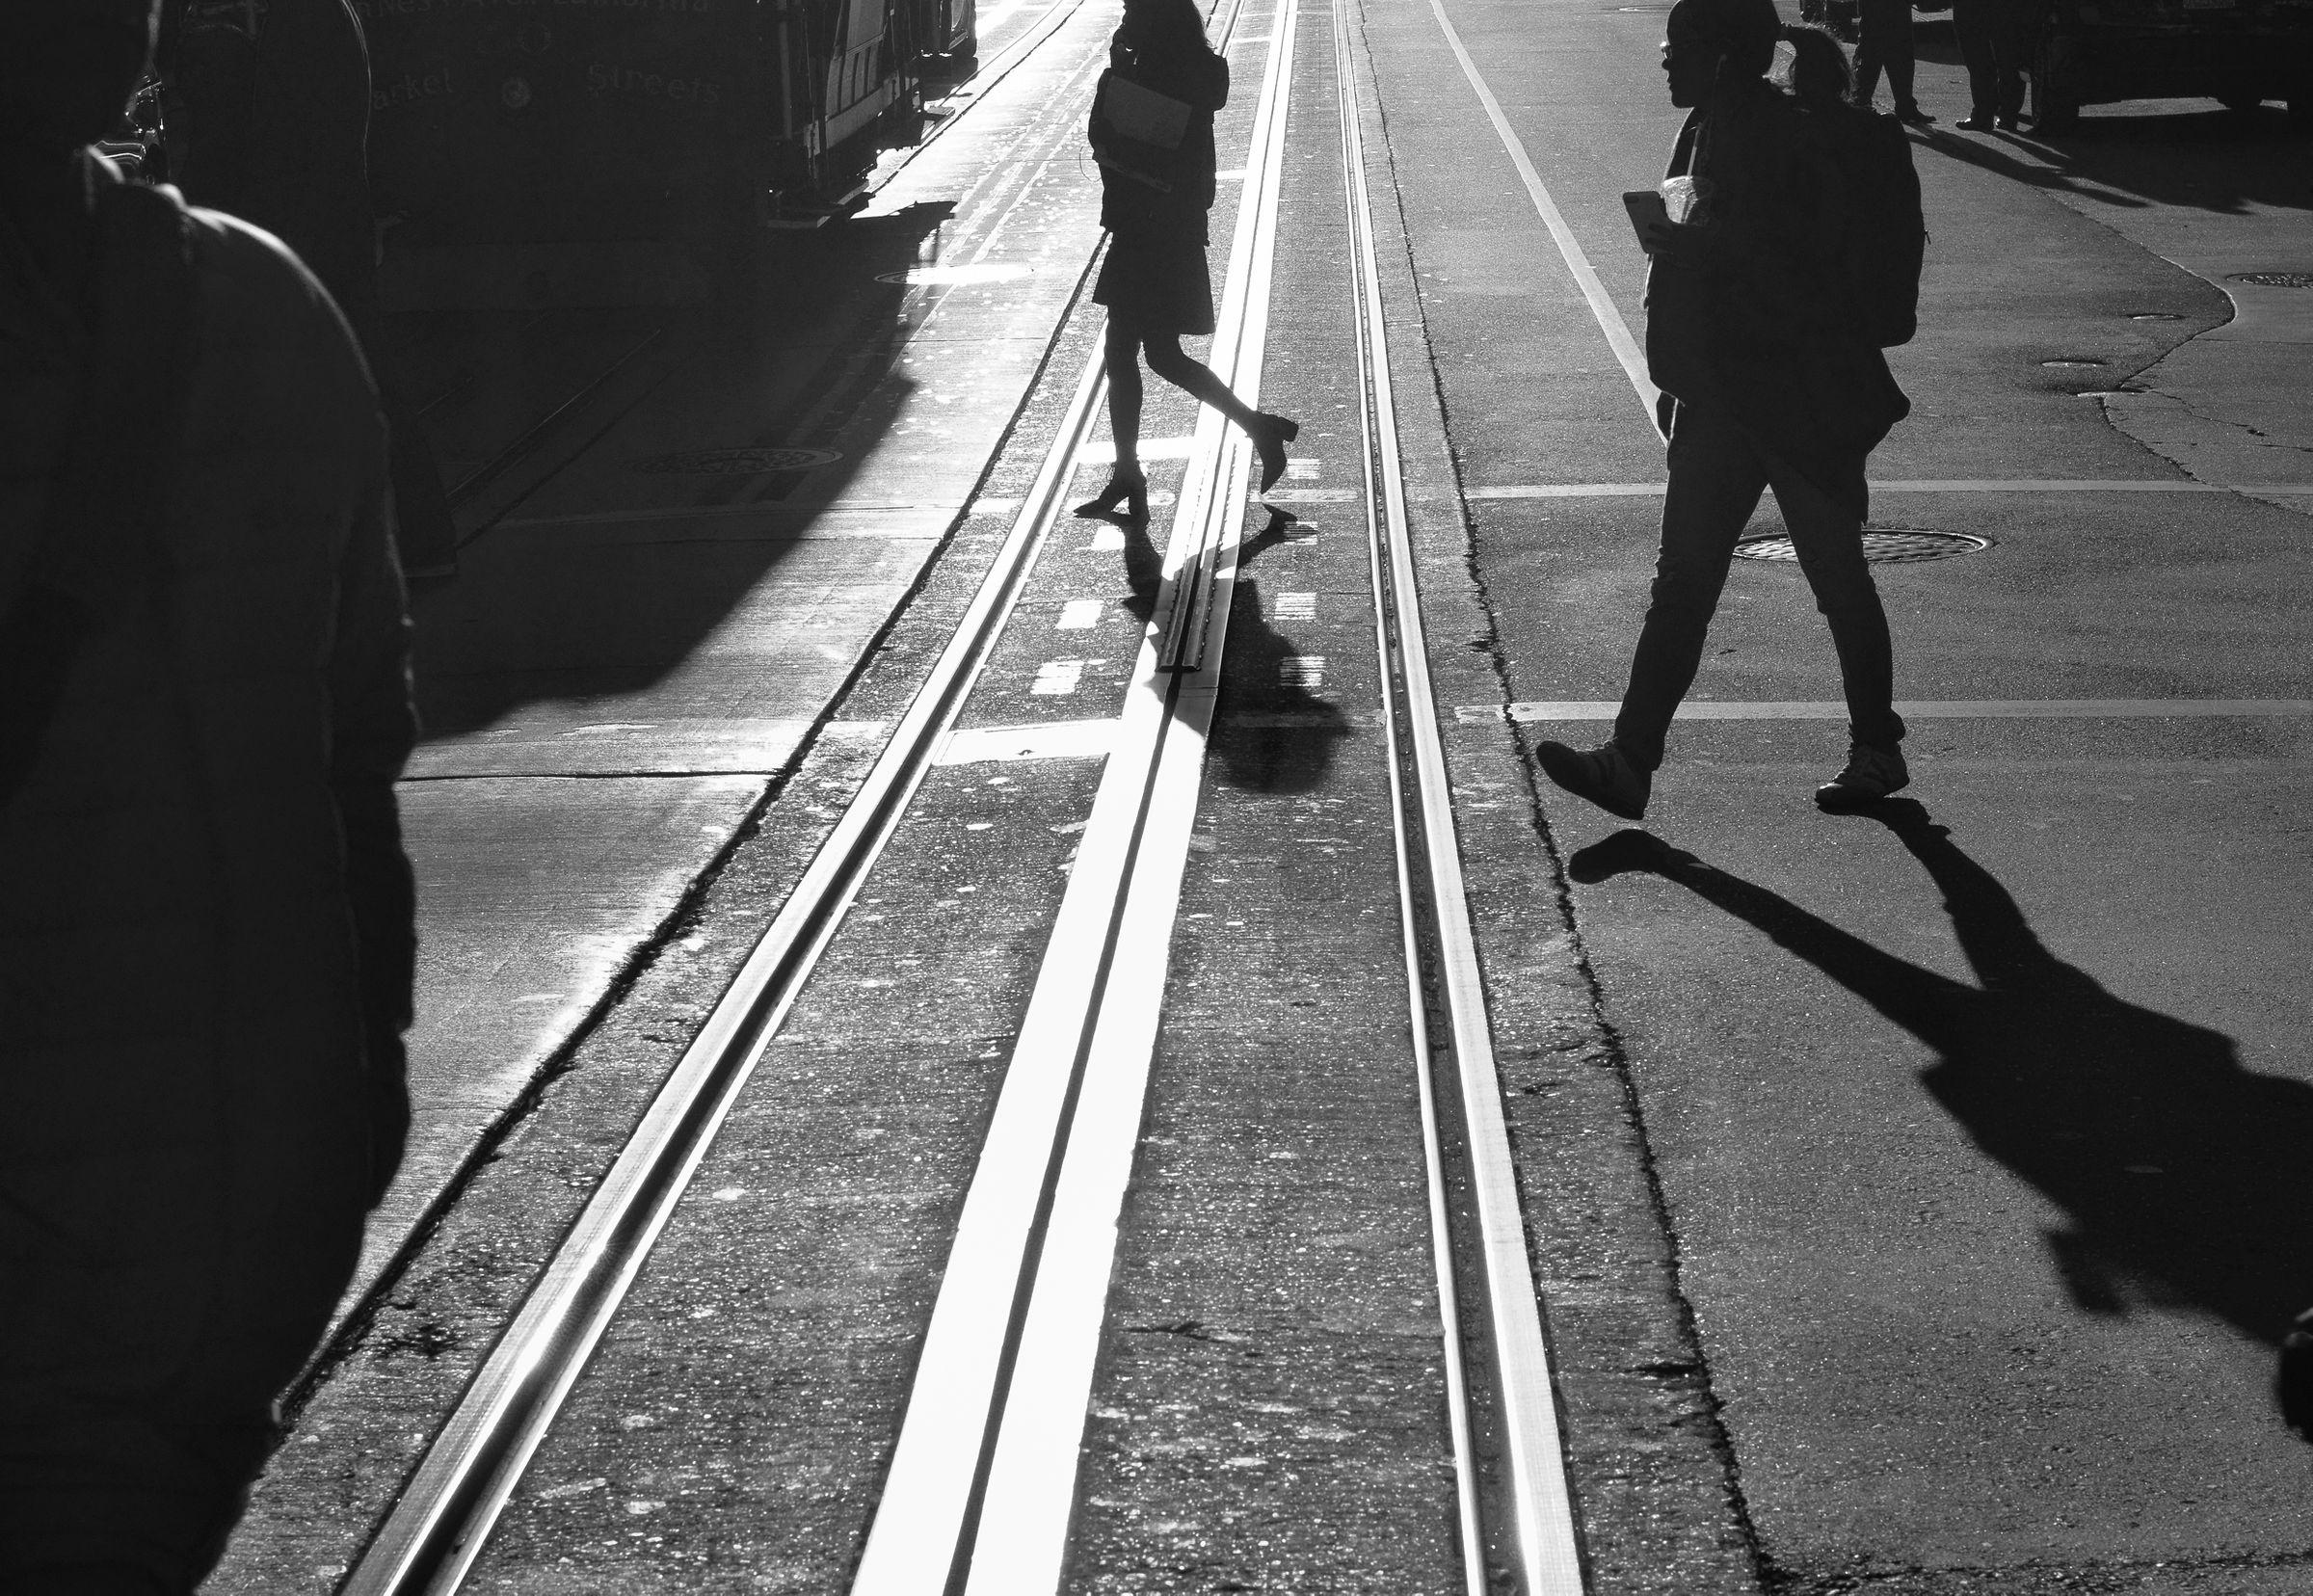 Crossing Tracks